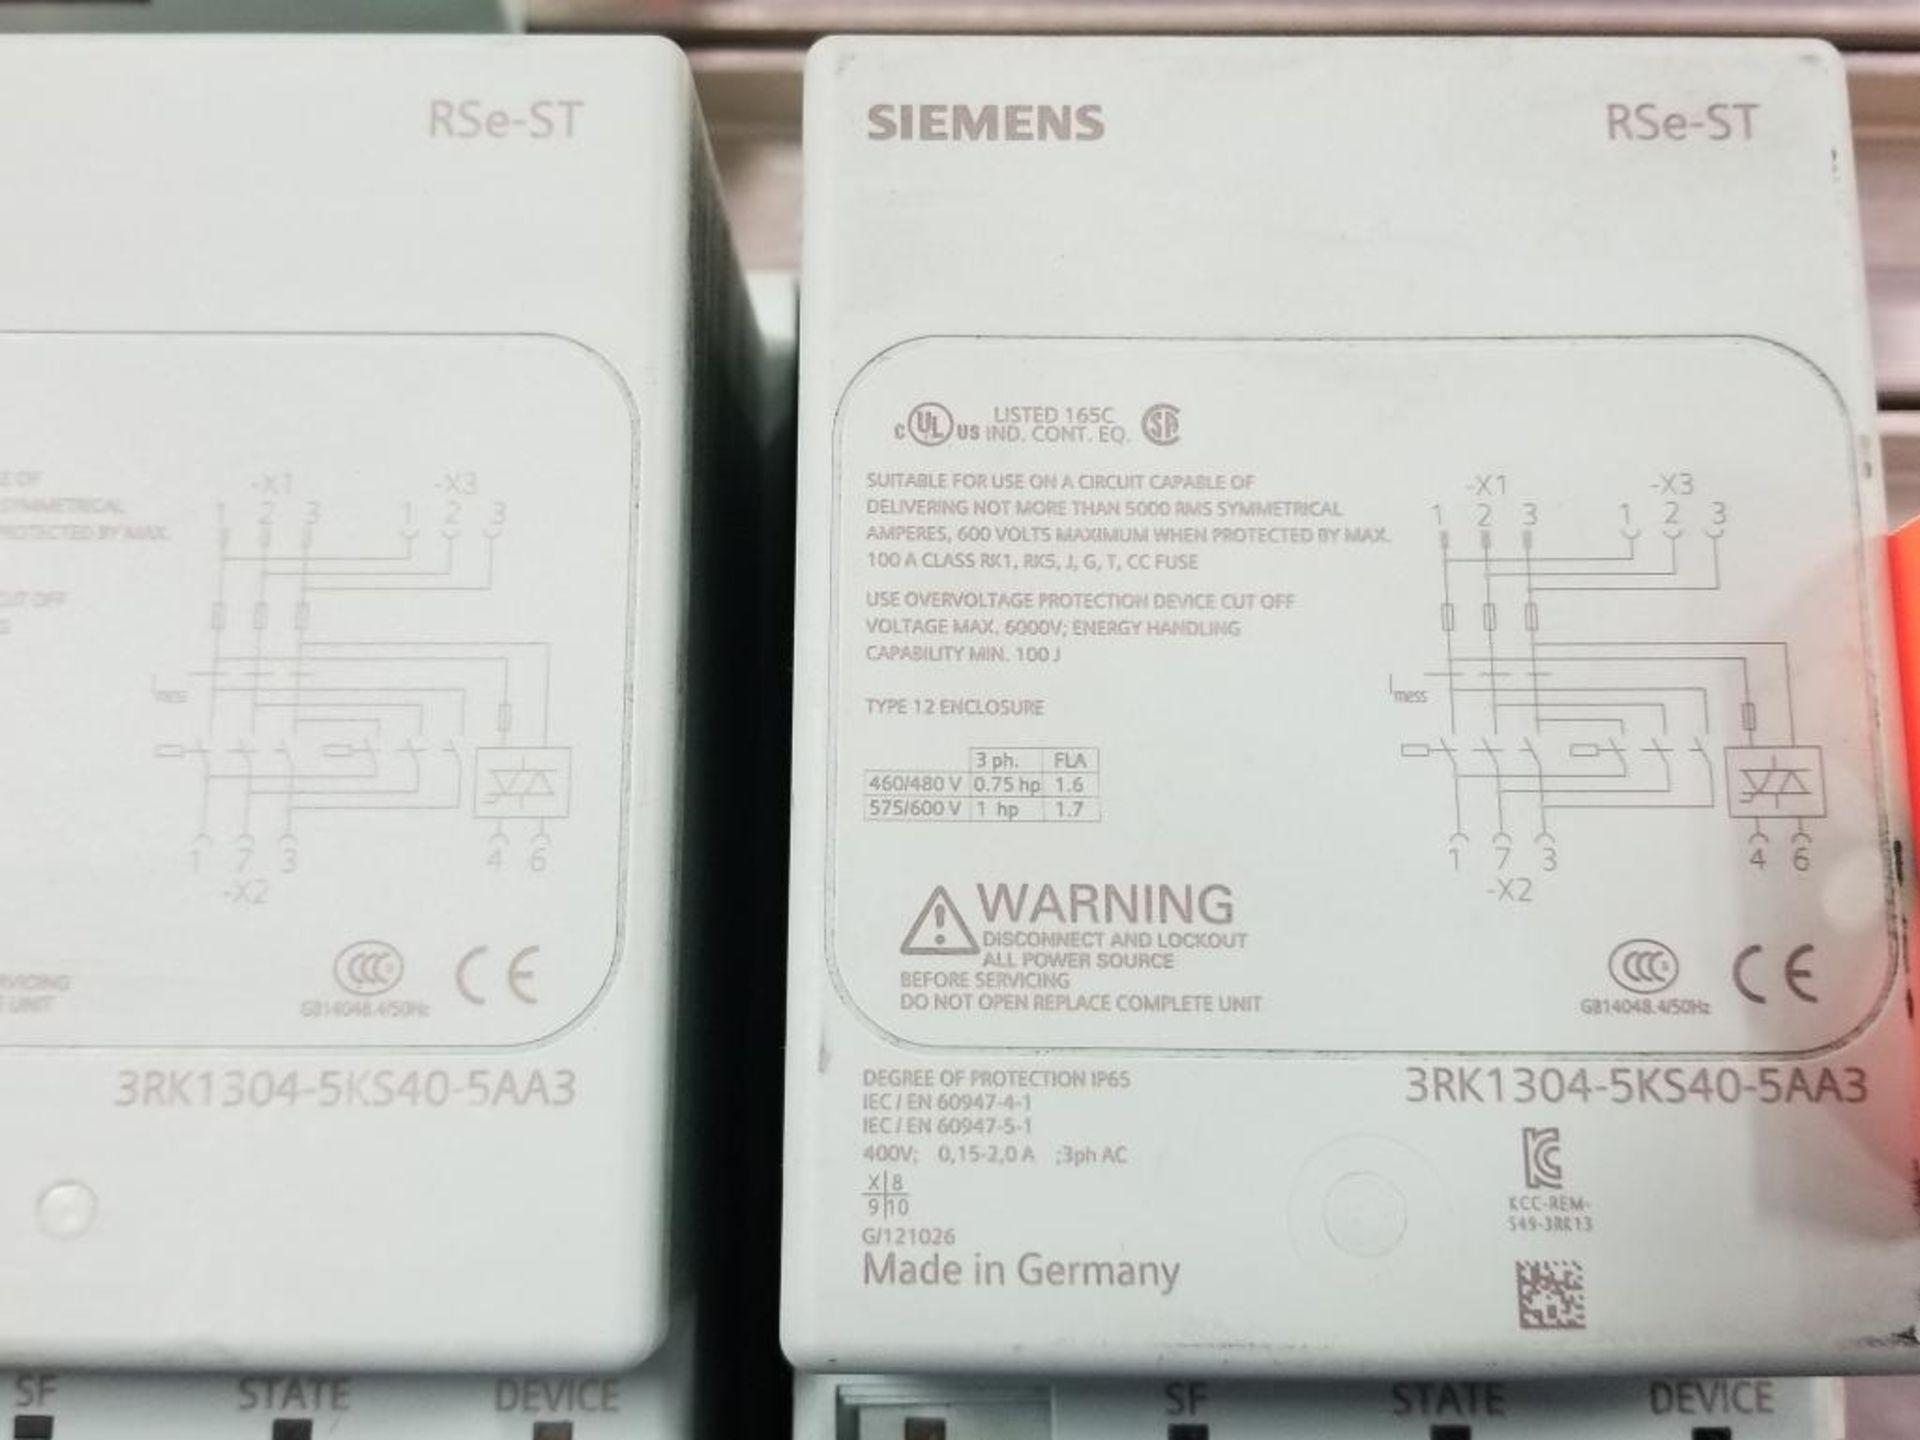 Qty 2 - Siemens RSe-ST 3RK1304-5KS40-5AA3 Reversing starter. - Image 2 of 7